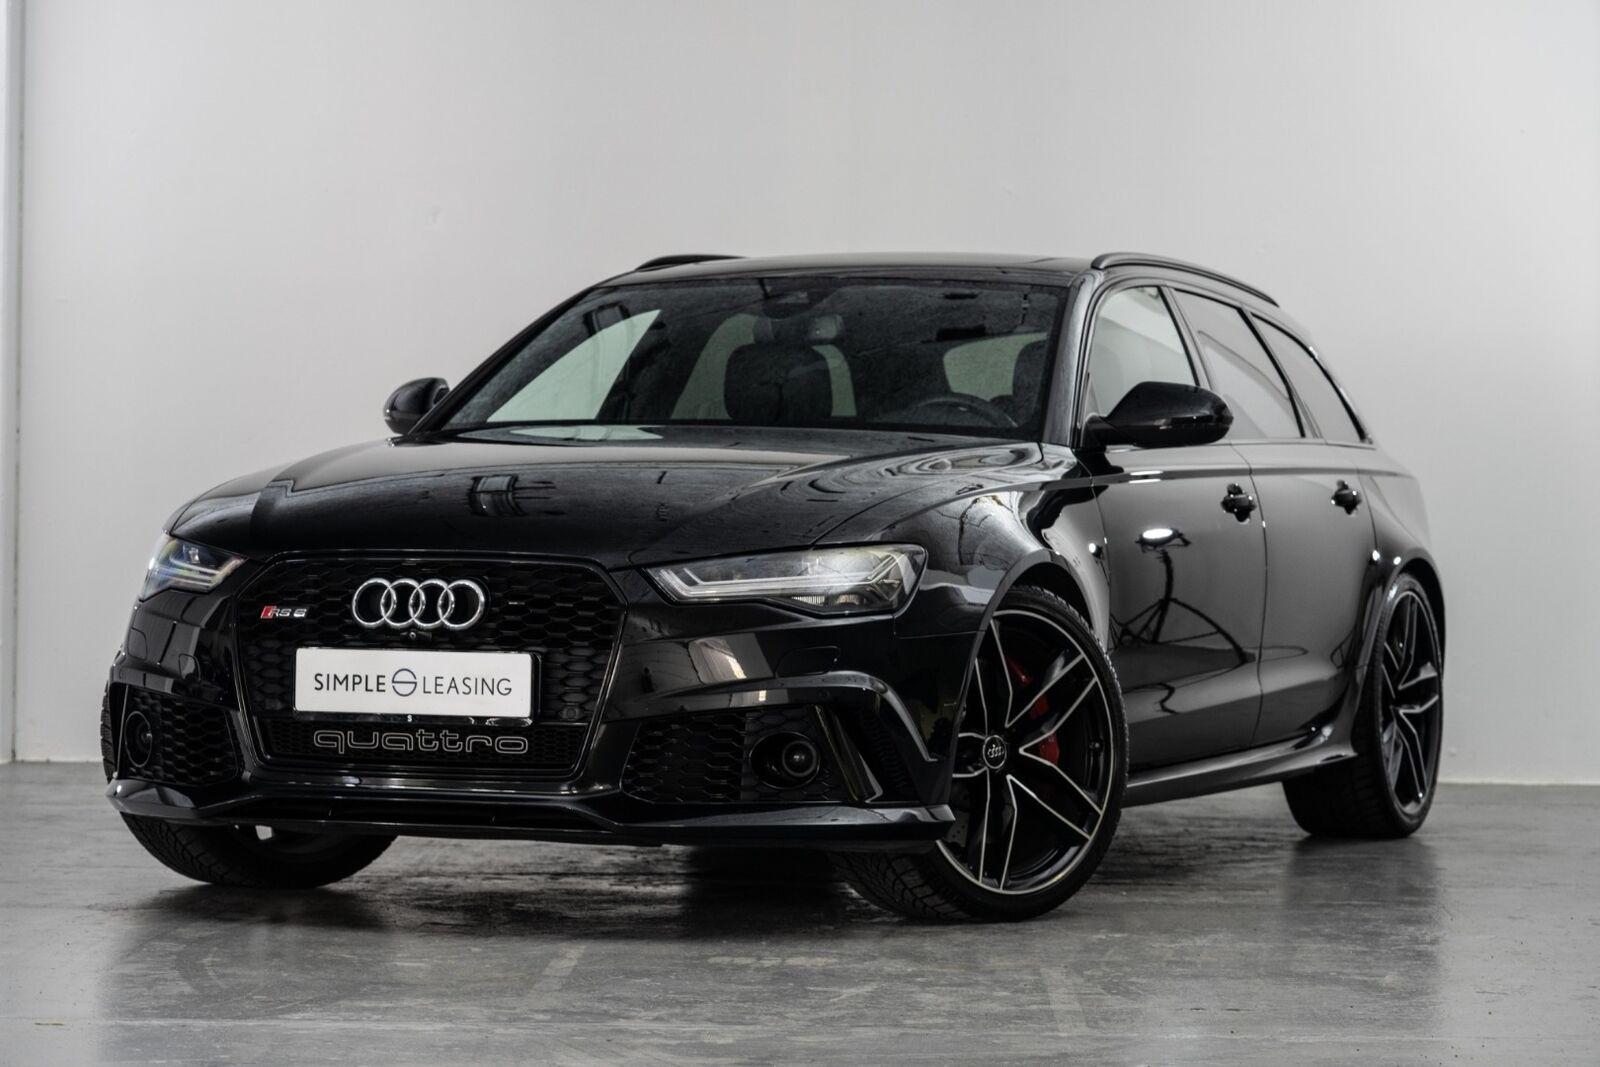 Audi RS6 4,0 TFSi Avant quattro Tiptr. 5d - 5.995 kr.